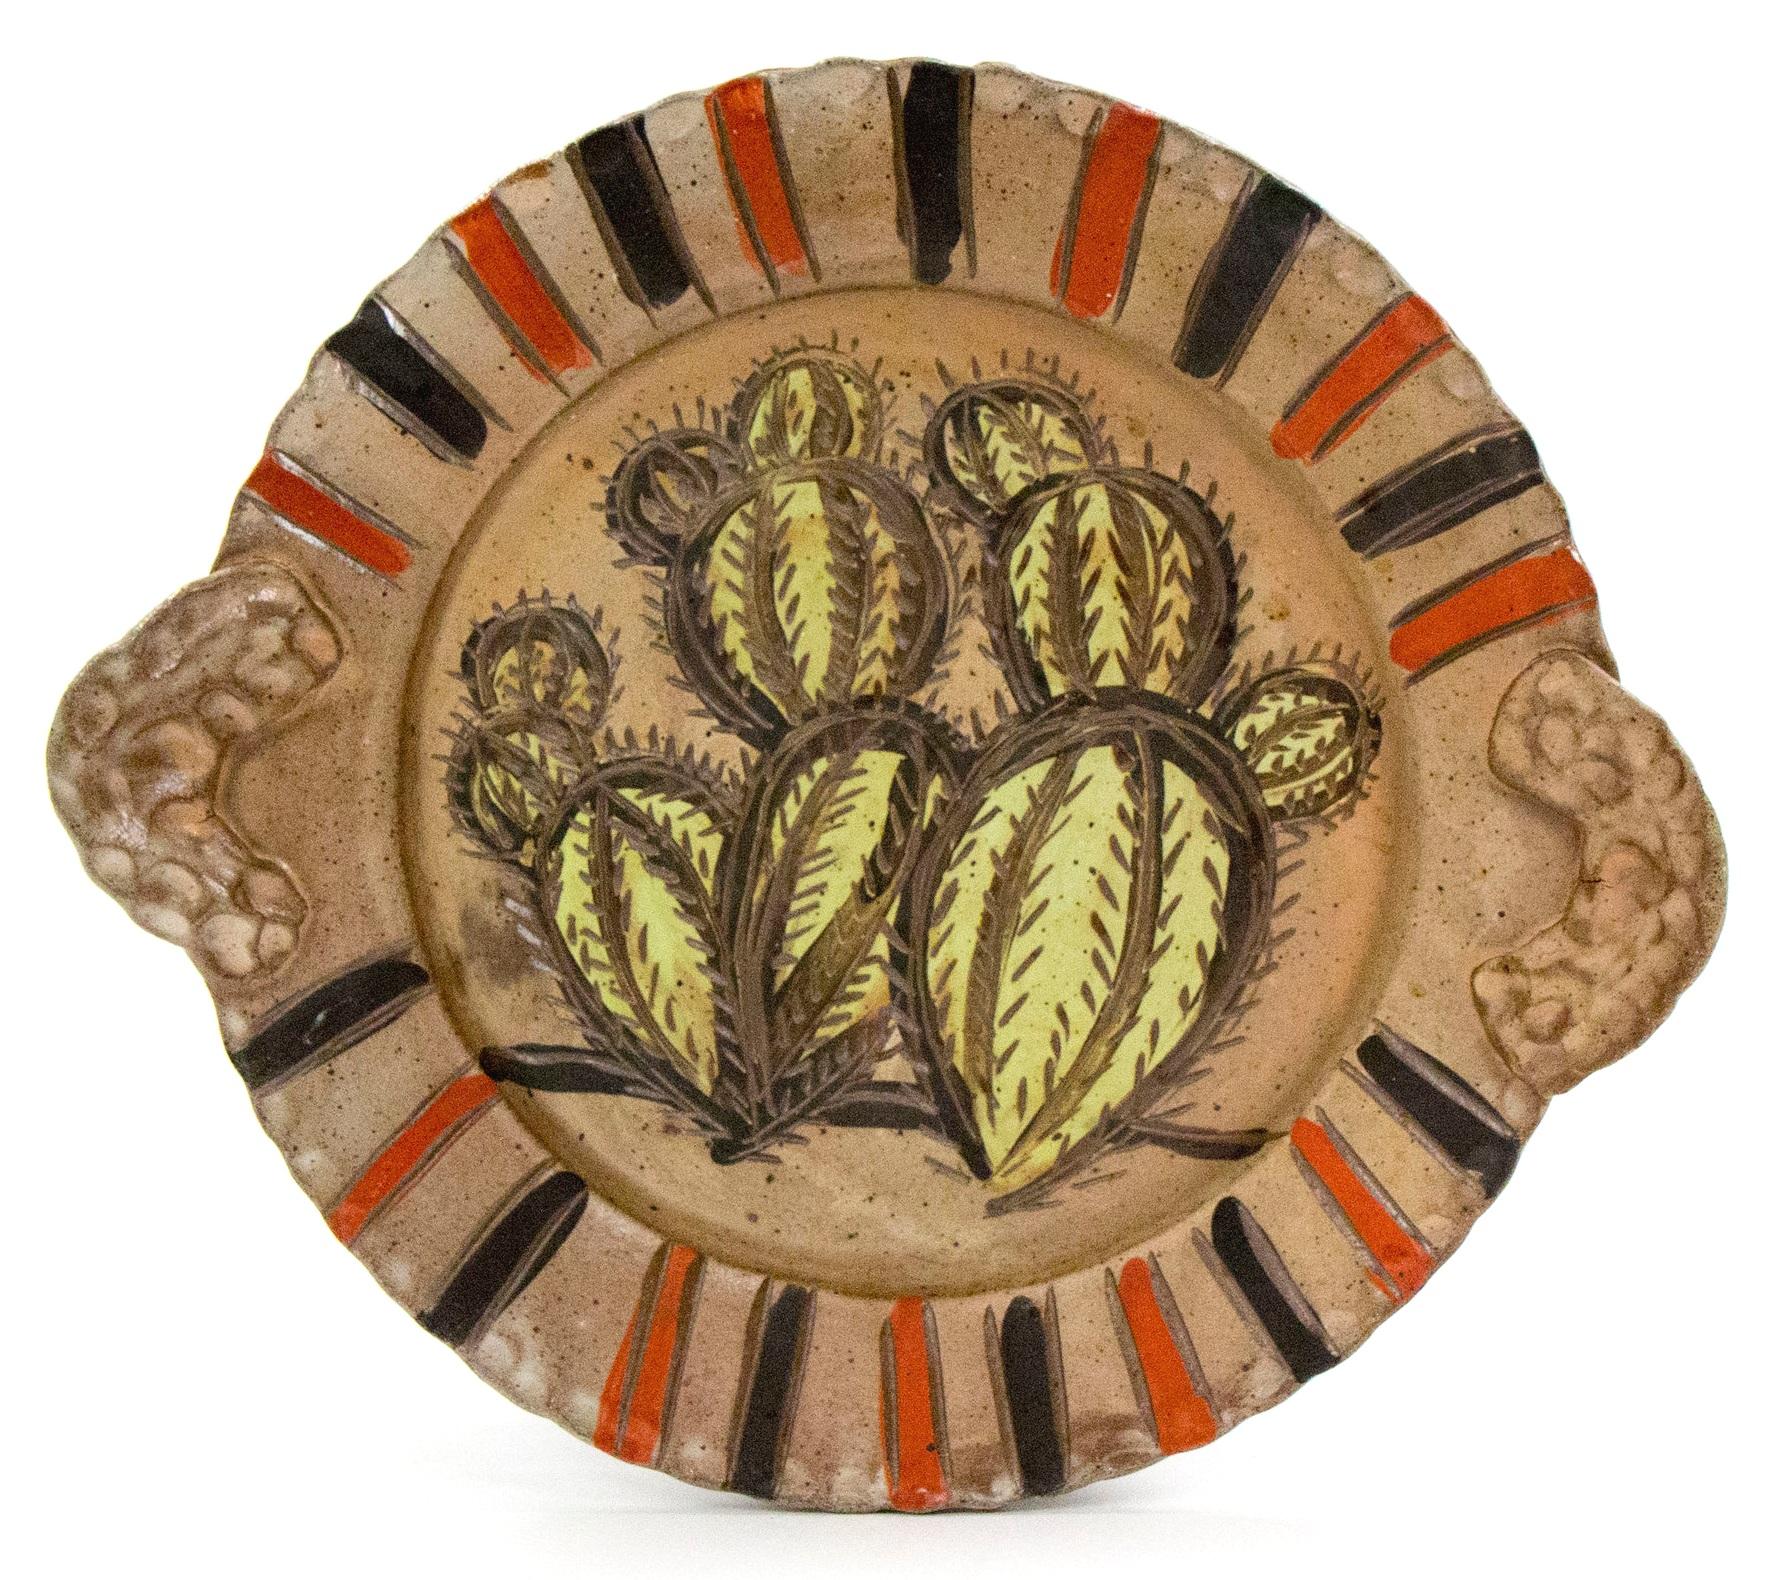 Cactus Platter, Brown Stoneware, Δ6 Reduction Salt-Fired, 2017